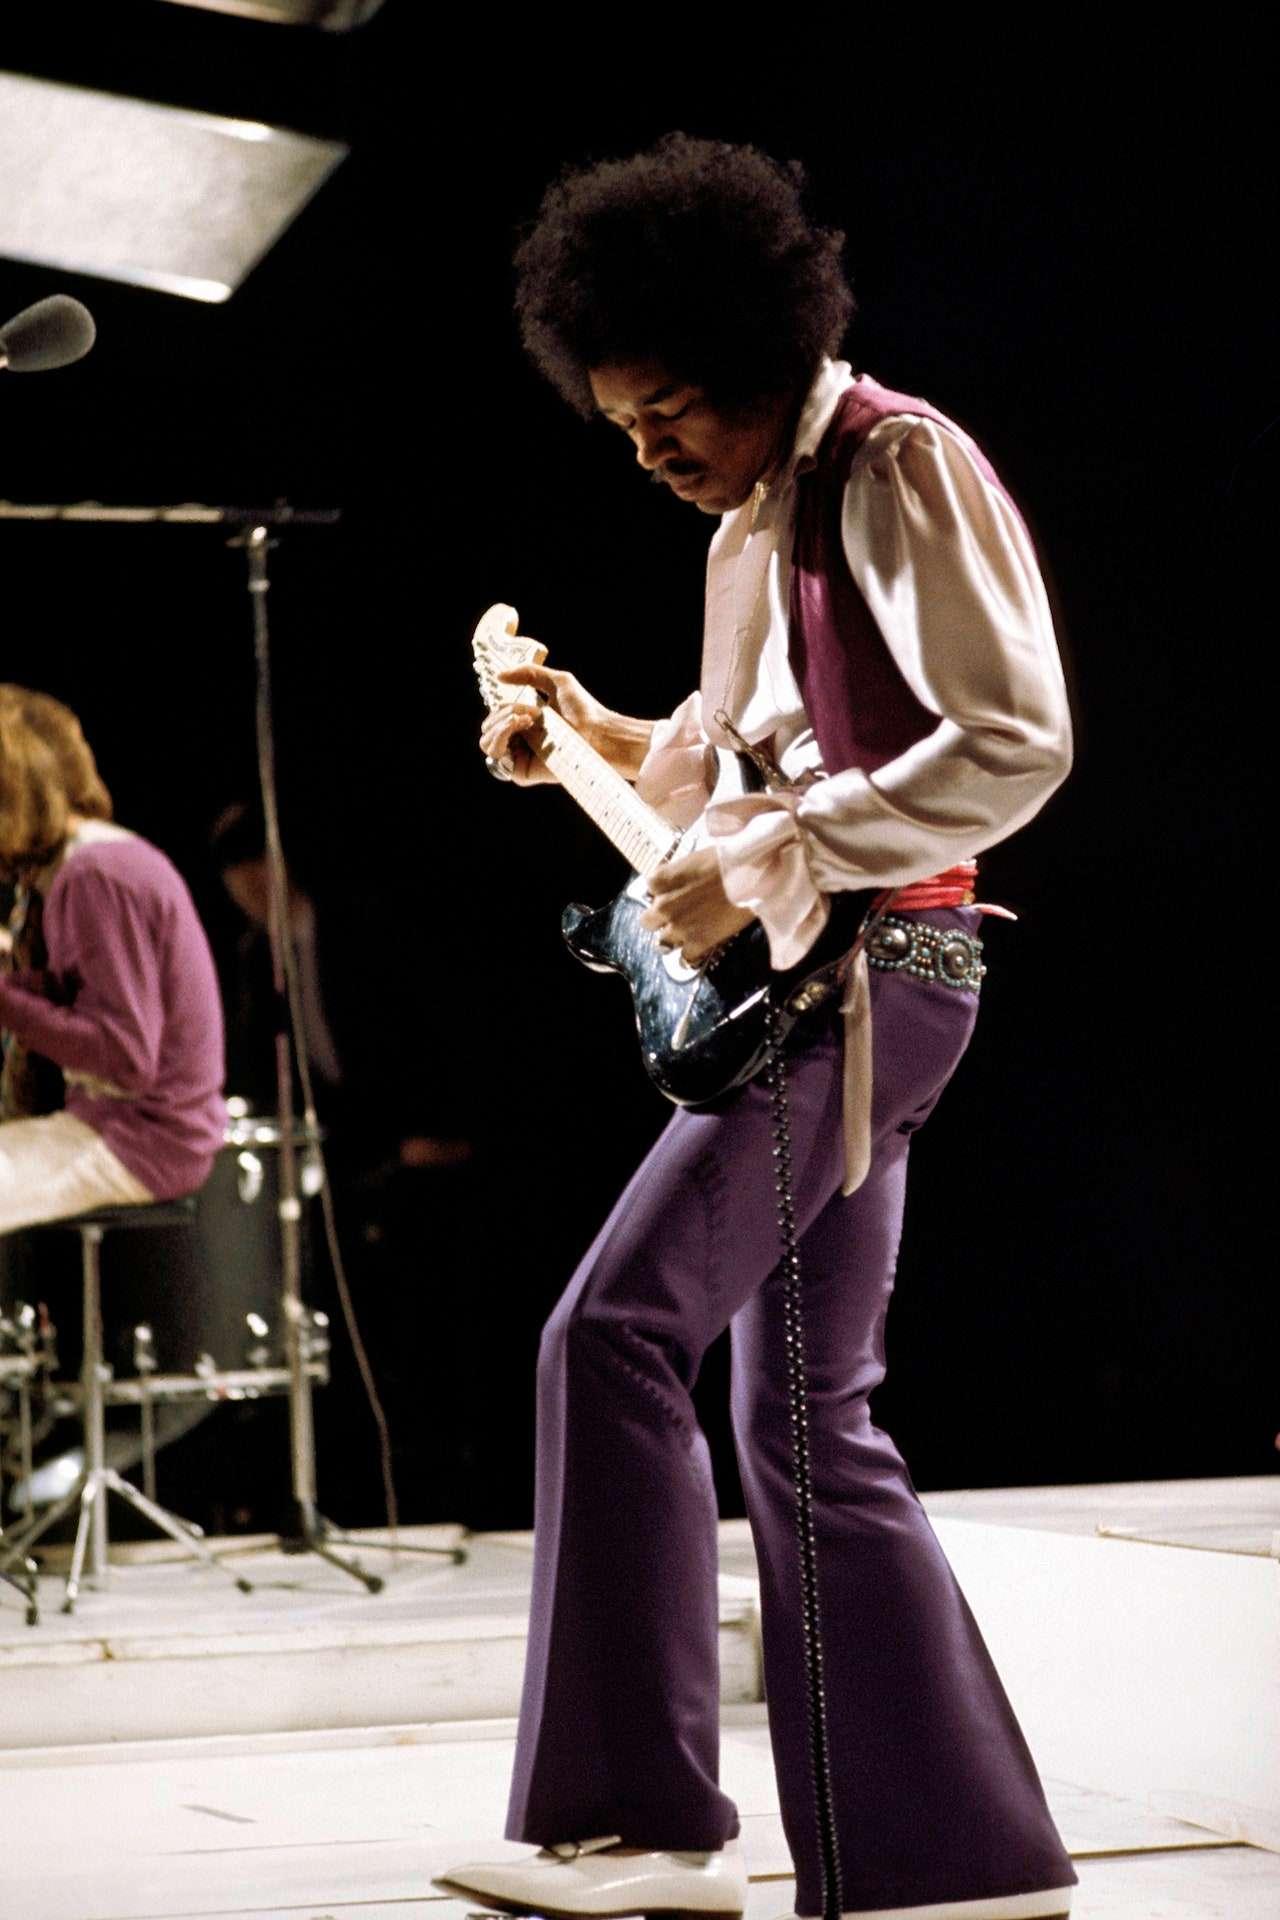 jimi Hendrix با شلوار فاق کوتاه